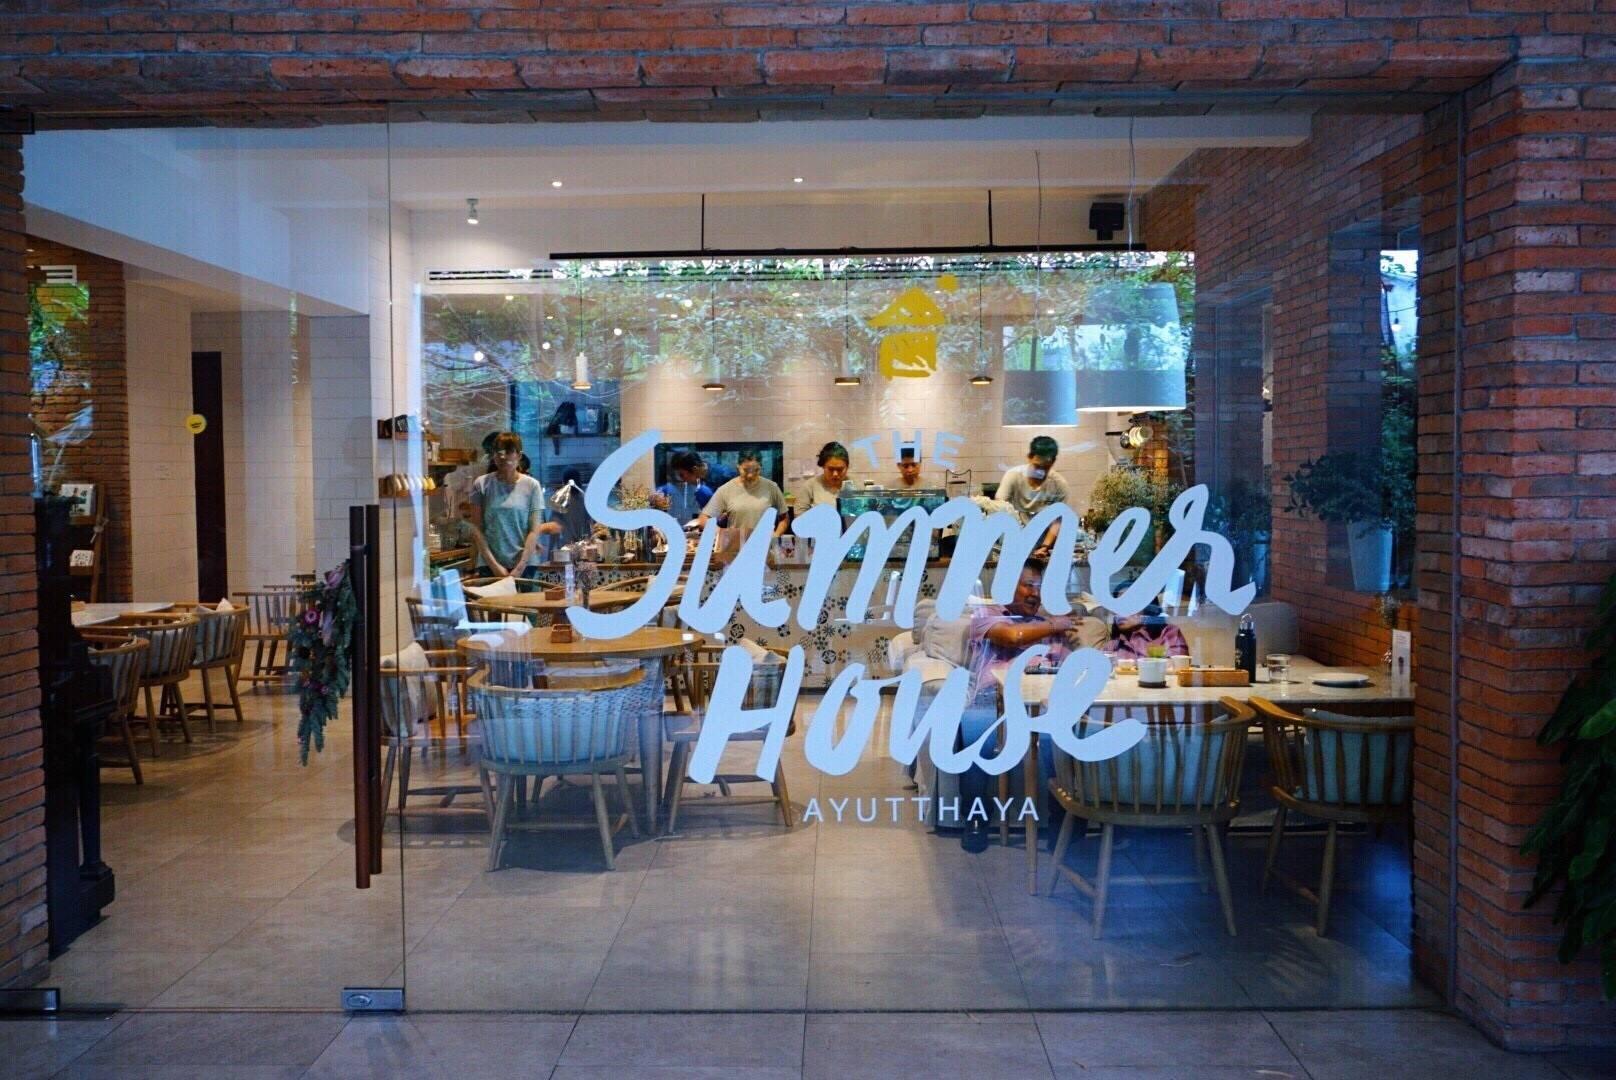 The Summer House Ayutthaya